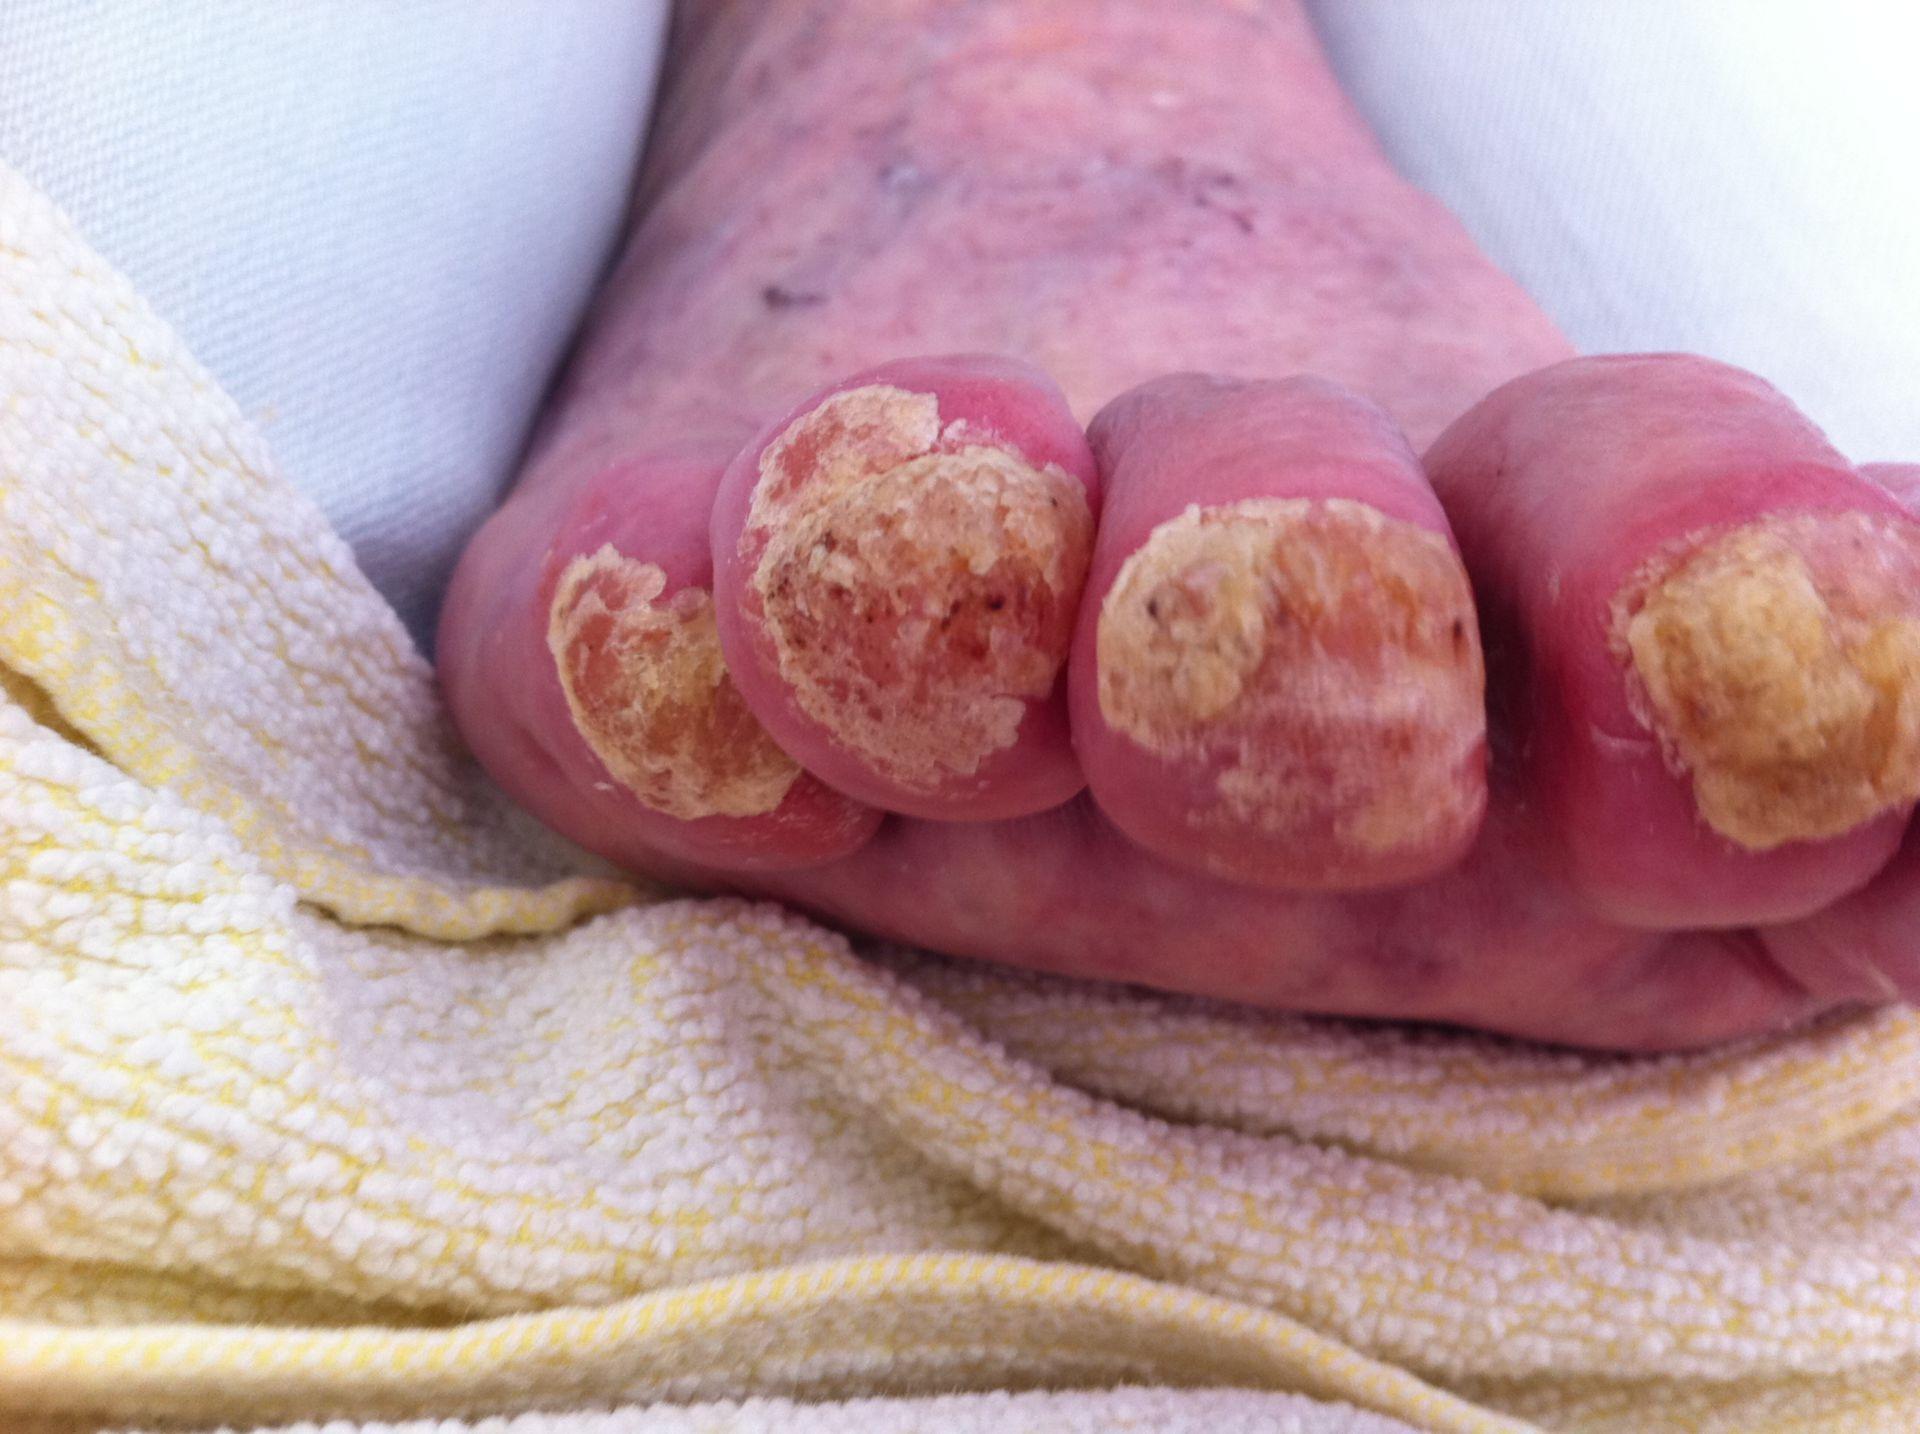 Krümel Psoriasis der Nägel